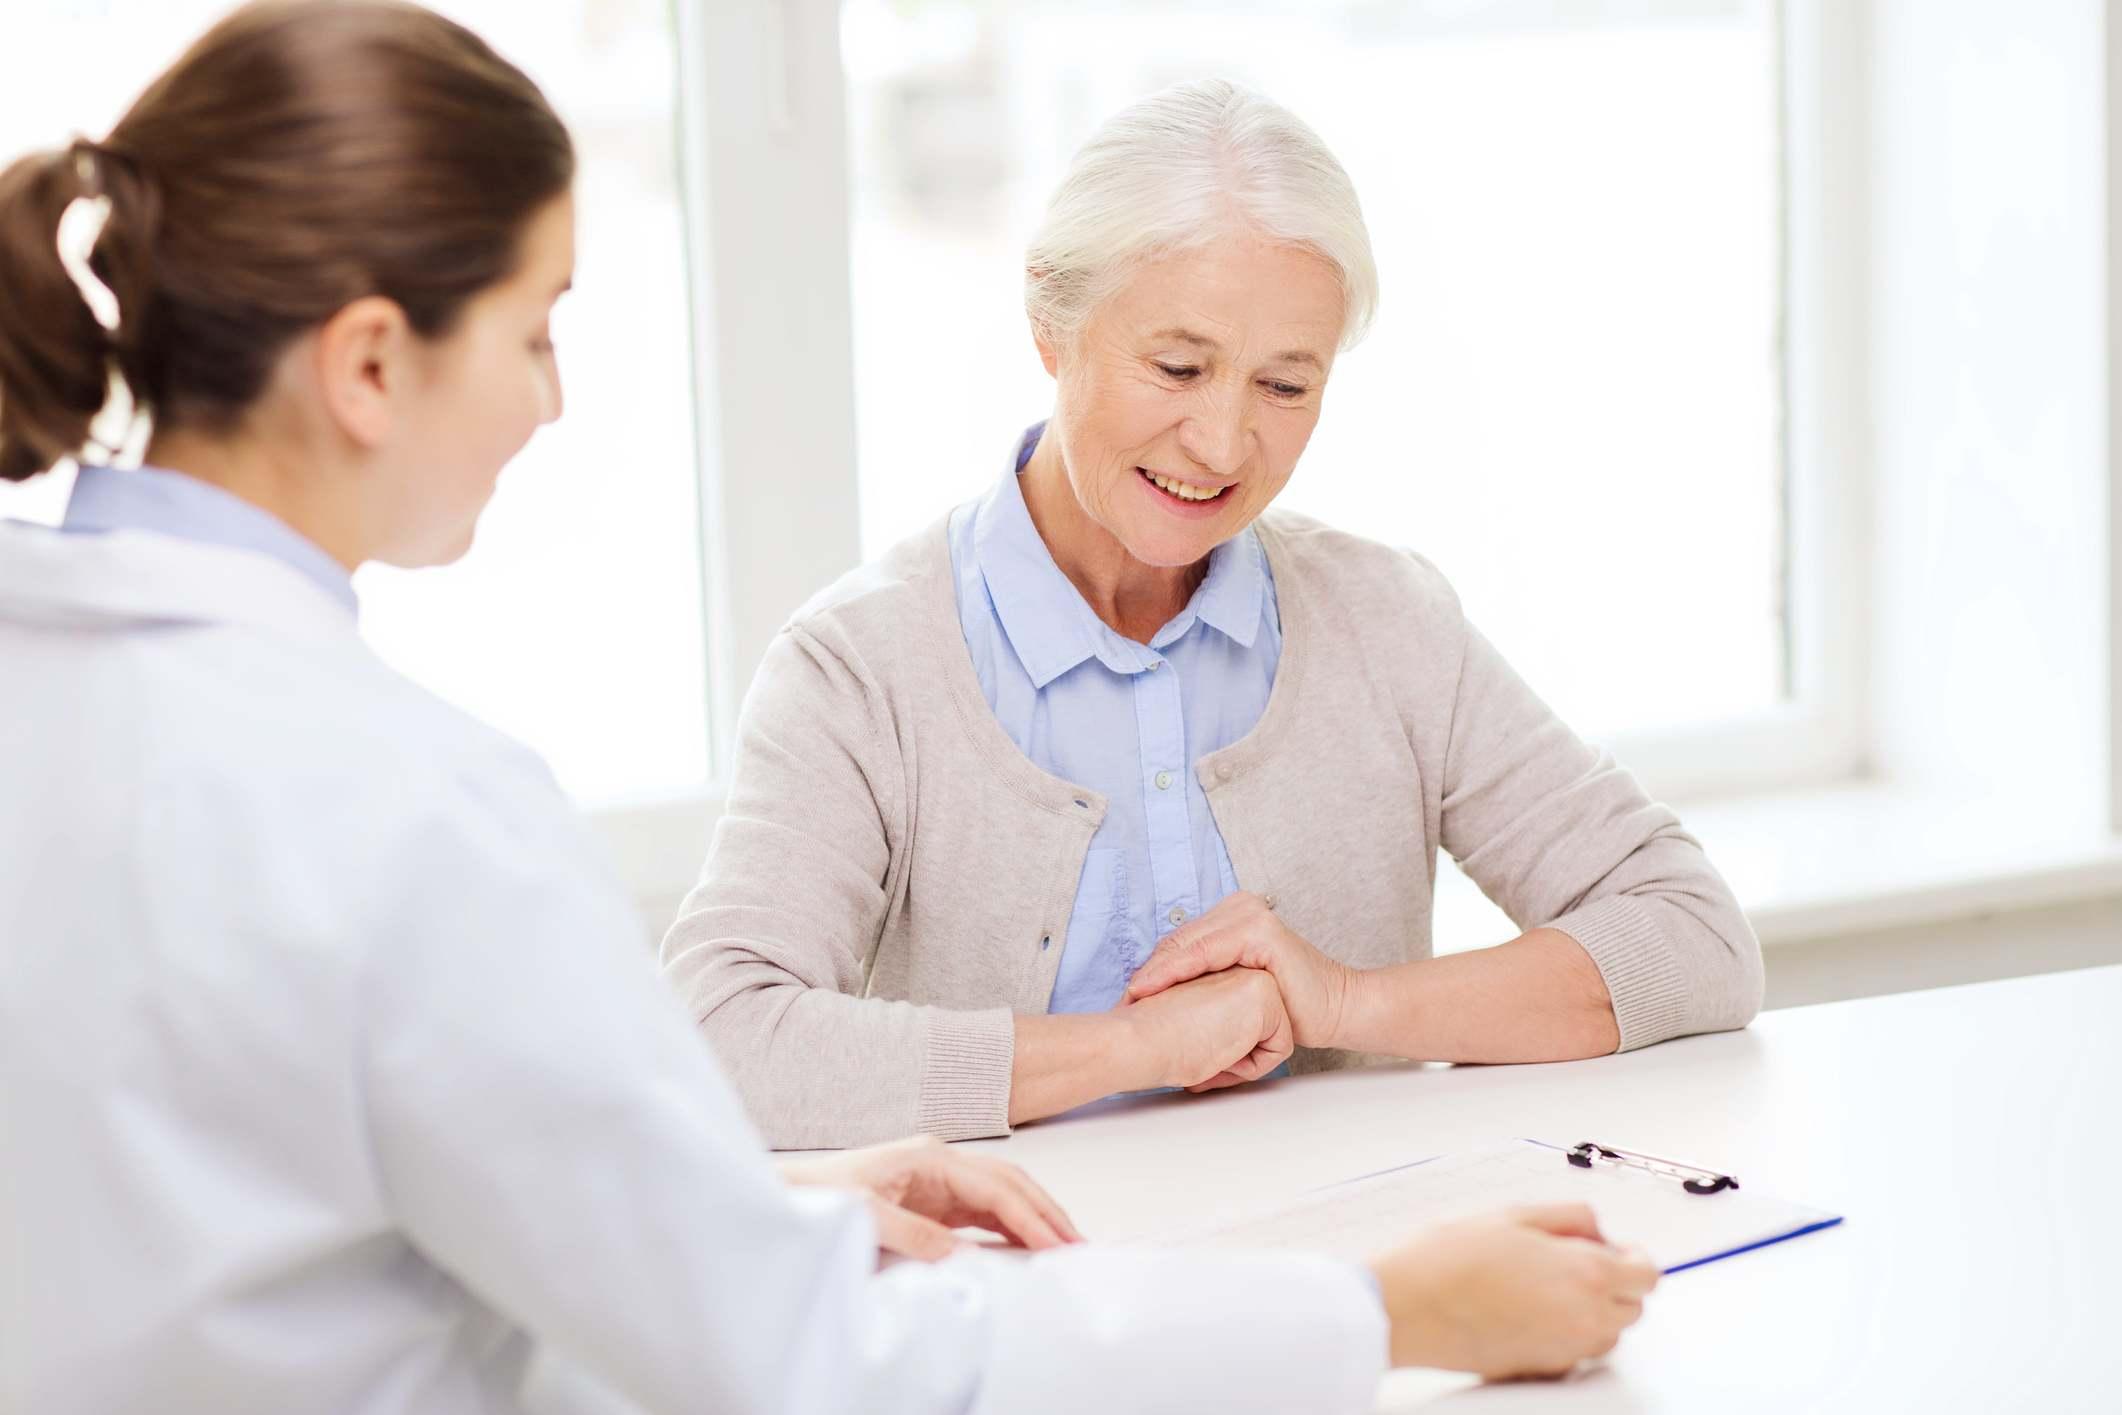 Better Patient Relationship